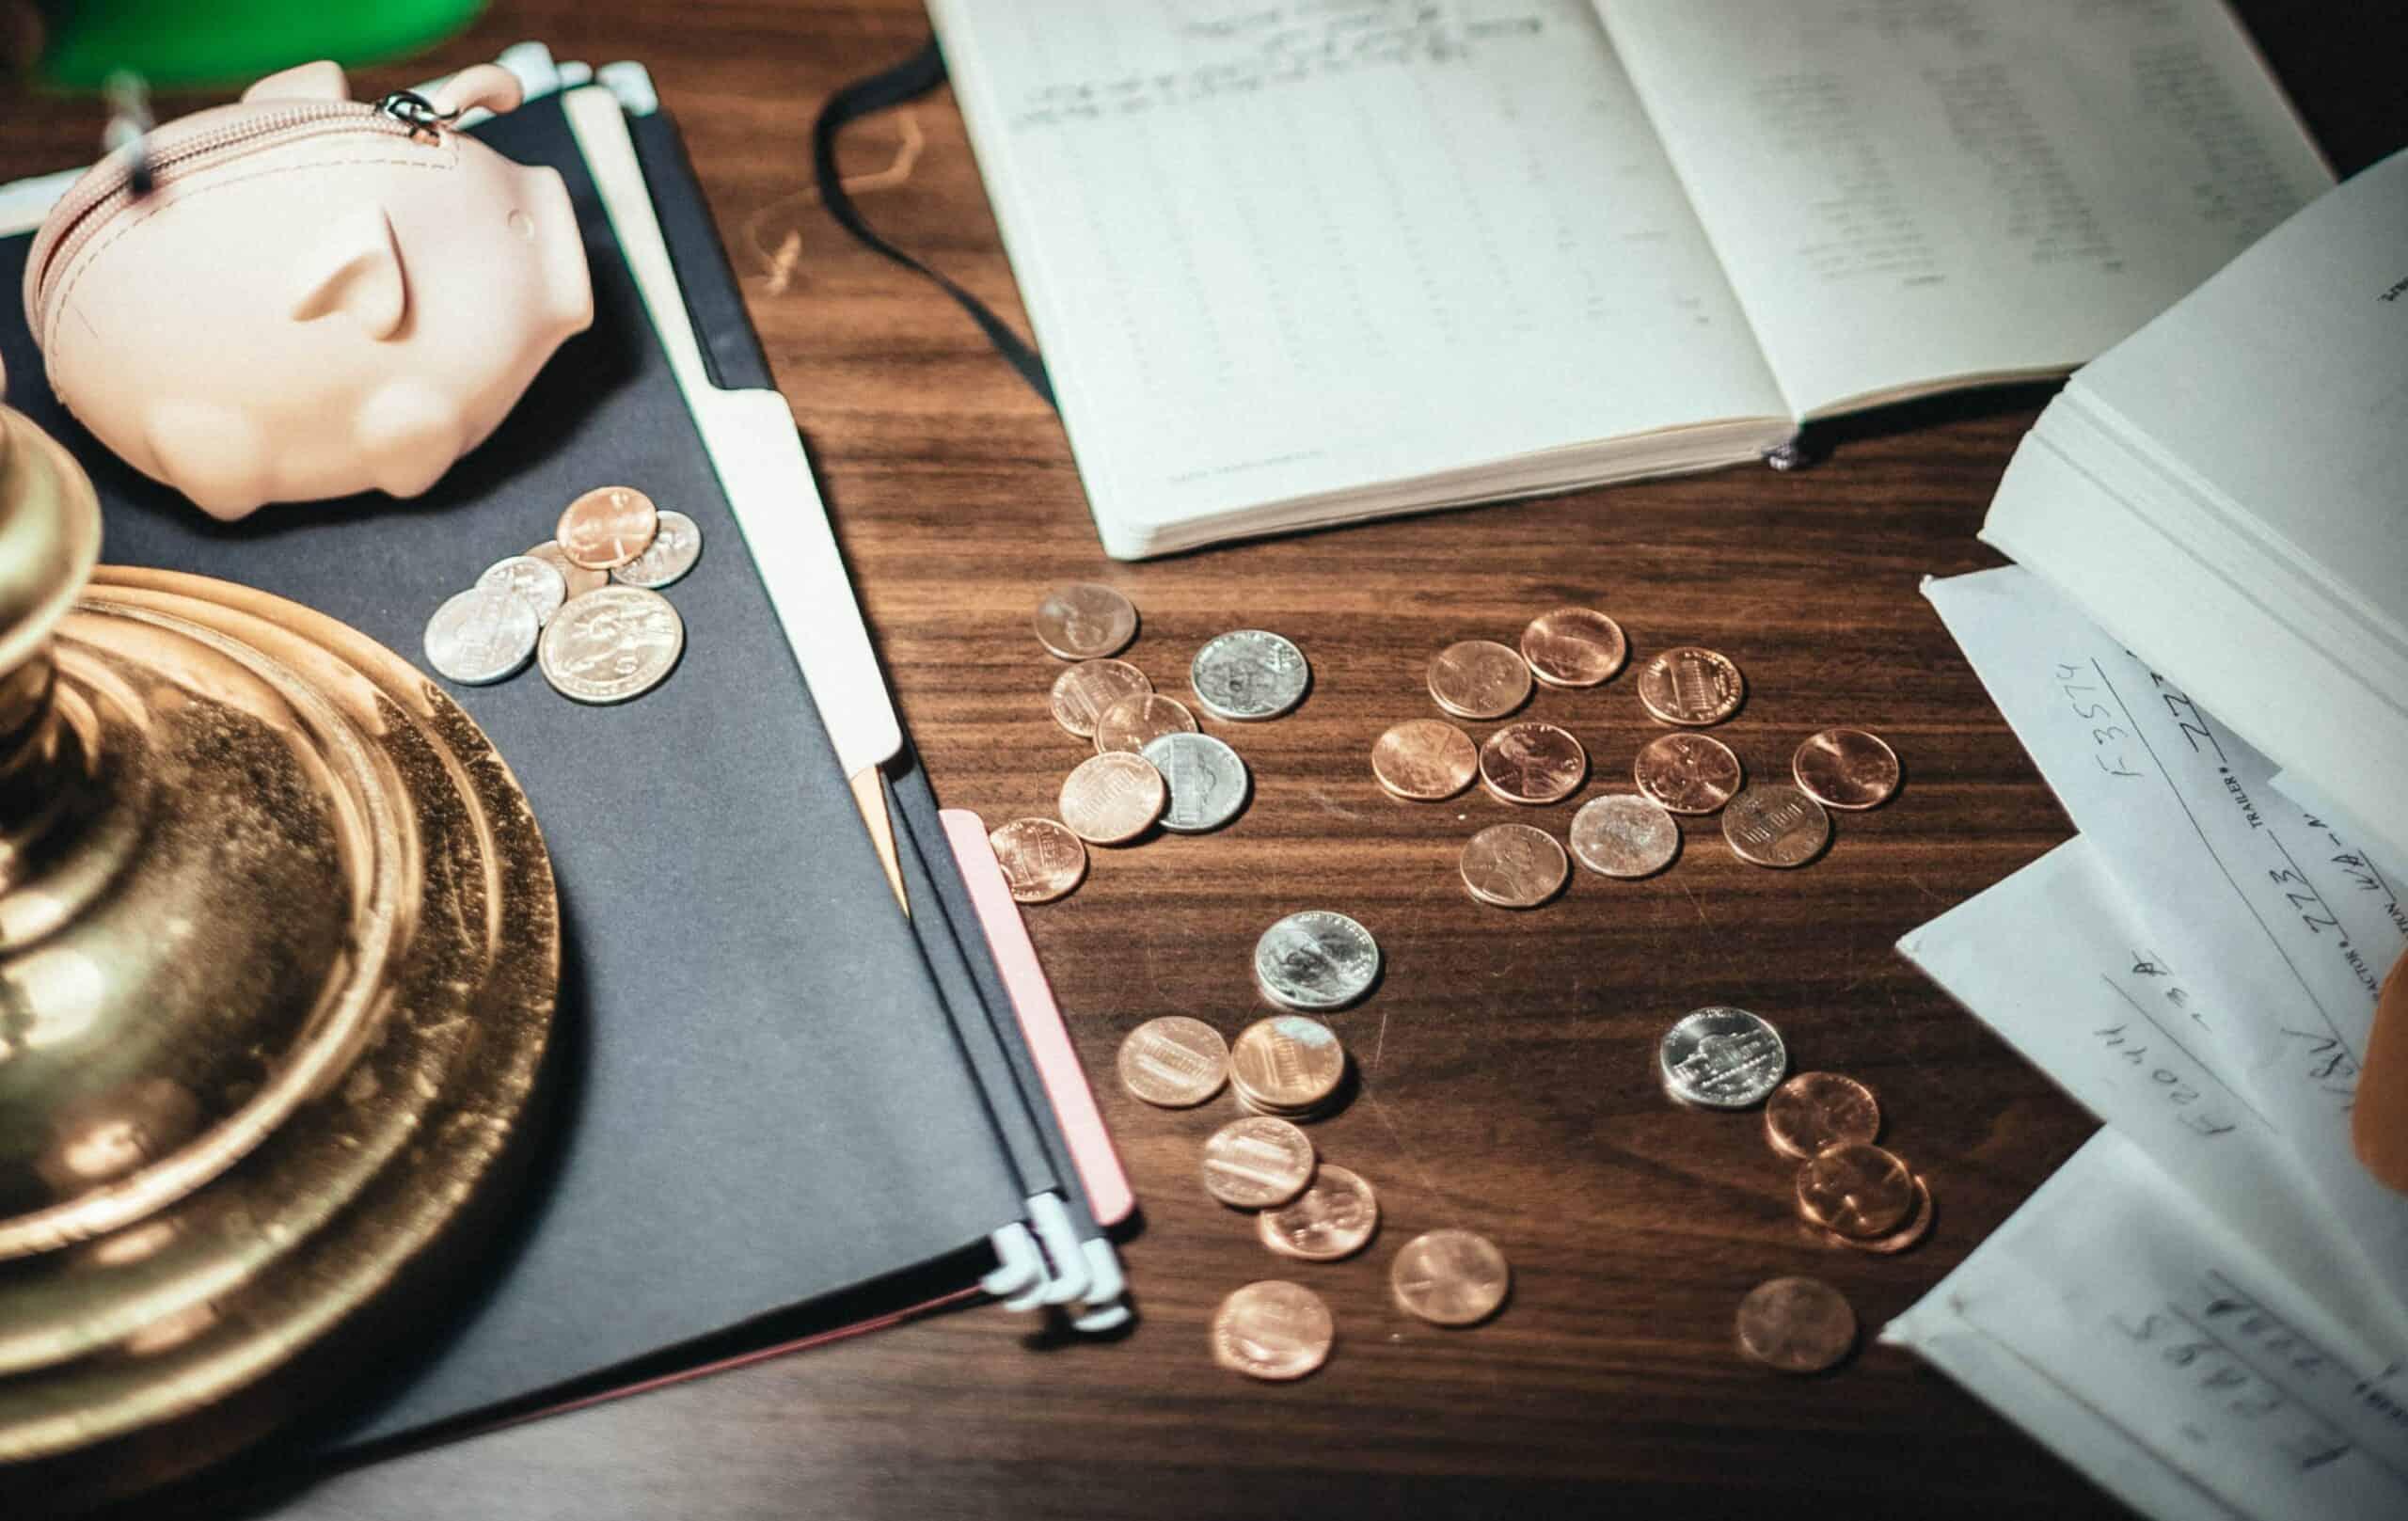 heropstartlening-verlengd-warfid-boekhouder-accountancy-waregem